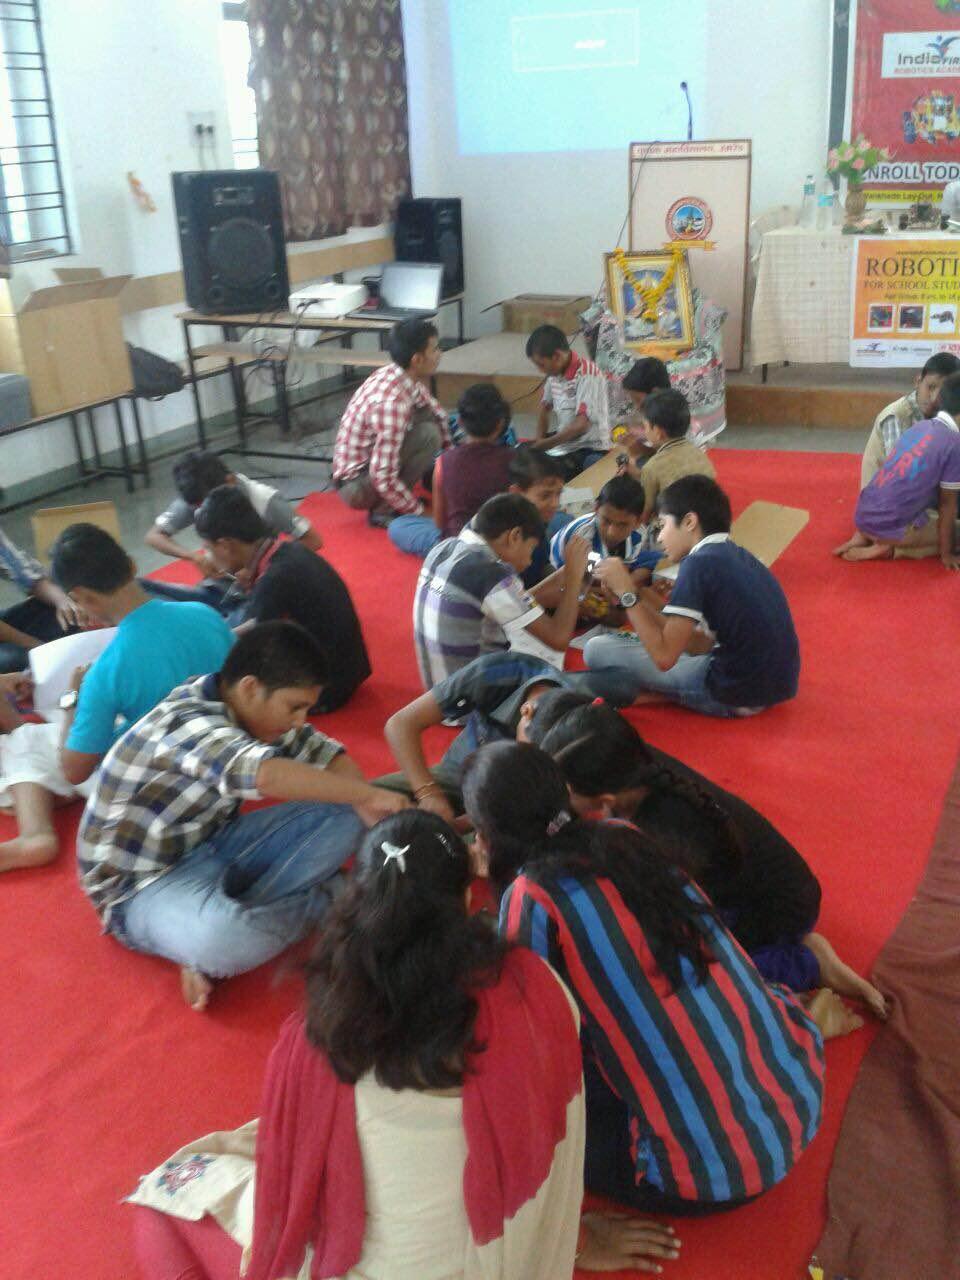 Diwali Special Robotics Batch Starts from 3rd November to 12th November 2016! Call Now on 8446767555 to book your seat!  Address: HABIB ANIMATOS P LTD,  INDIAFIRST ROBOTICS, Plot No. 11, Vishwesh, Pushpak Park, Cosmopolitan Lane, Near Fab India Showroom, ITI Road, Aundh, Pune-7.  Visit us: www.indiafirstrobotics.com